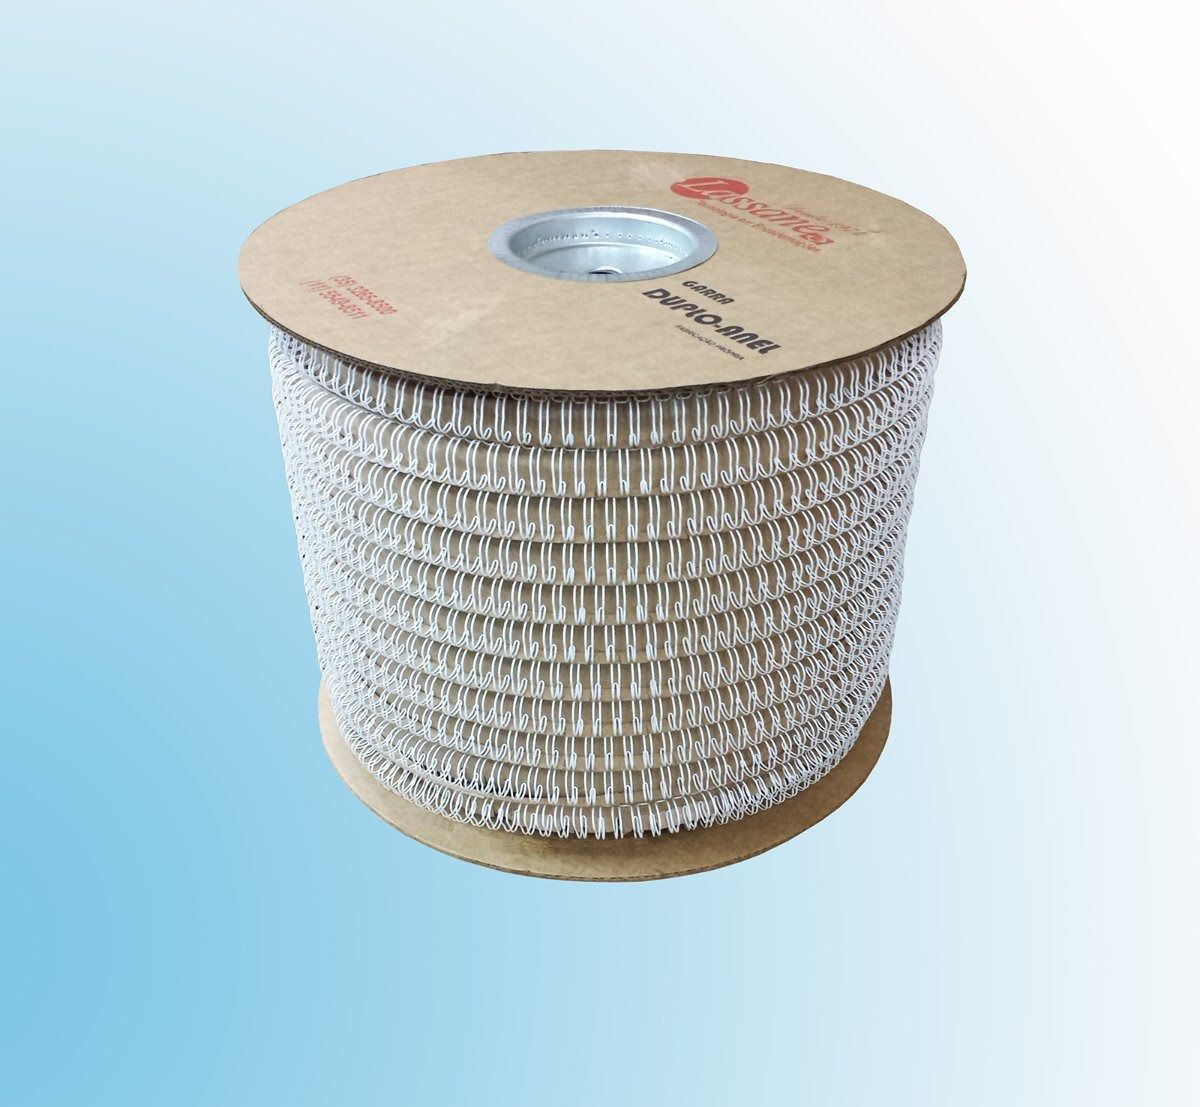 Bobina Espiral Garra Duplo Anel Wire-o 3x1 Diam 9/16 110 Fls